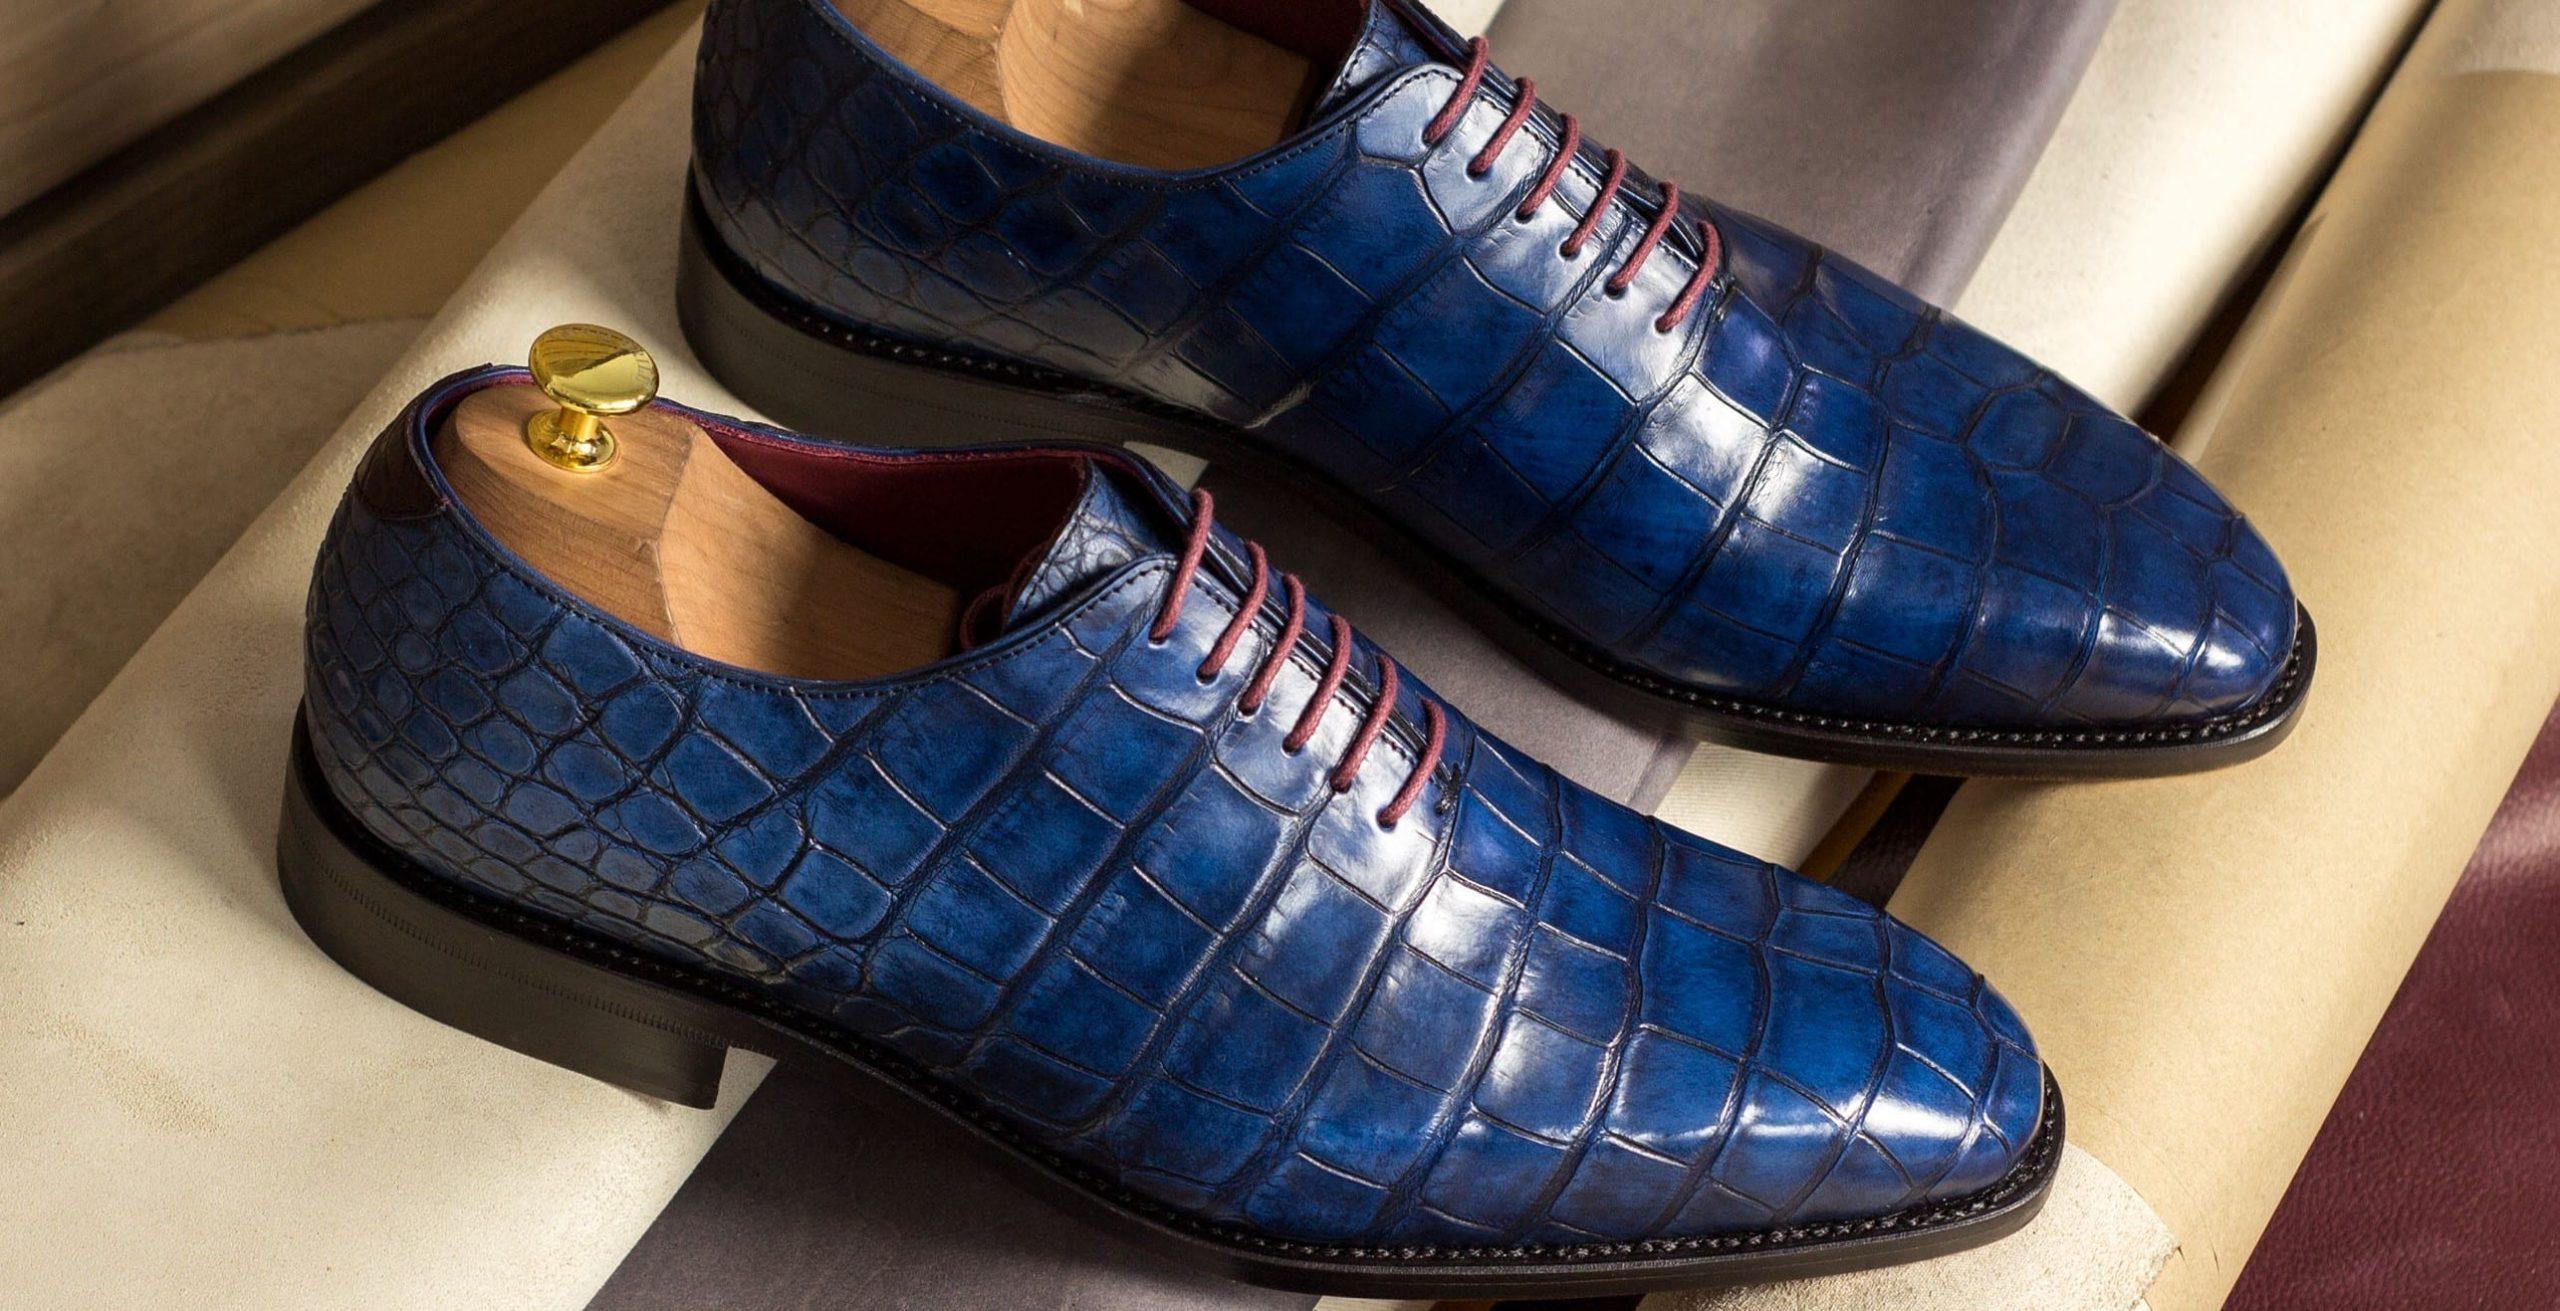 Information about exotic skins footwear at Civardi